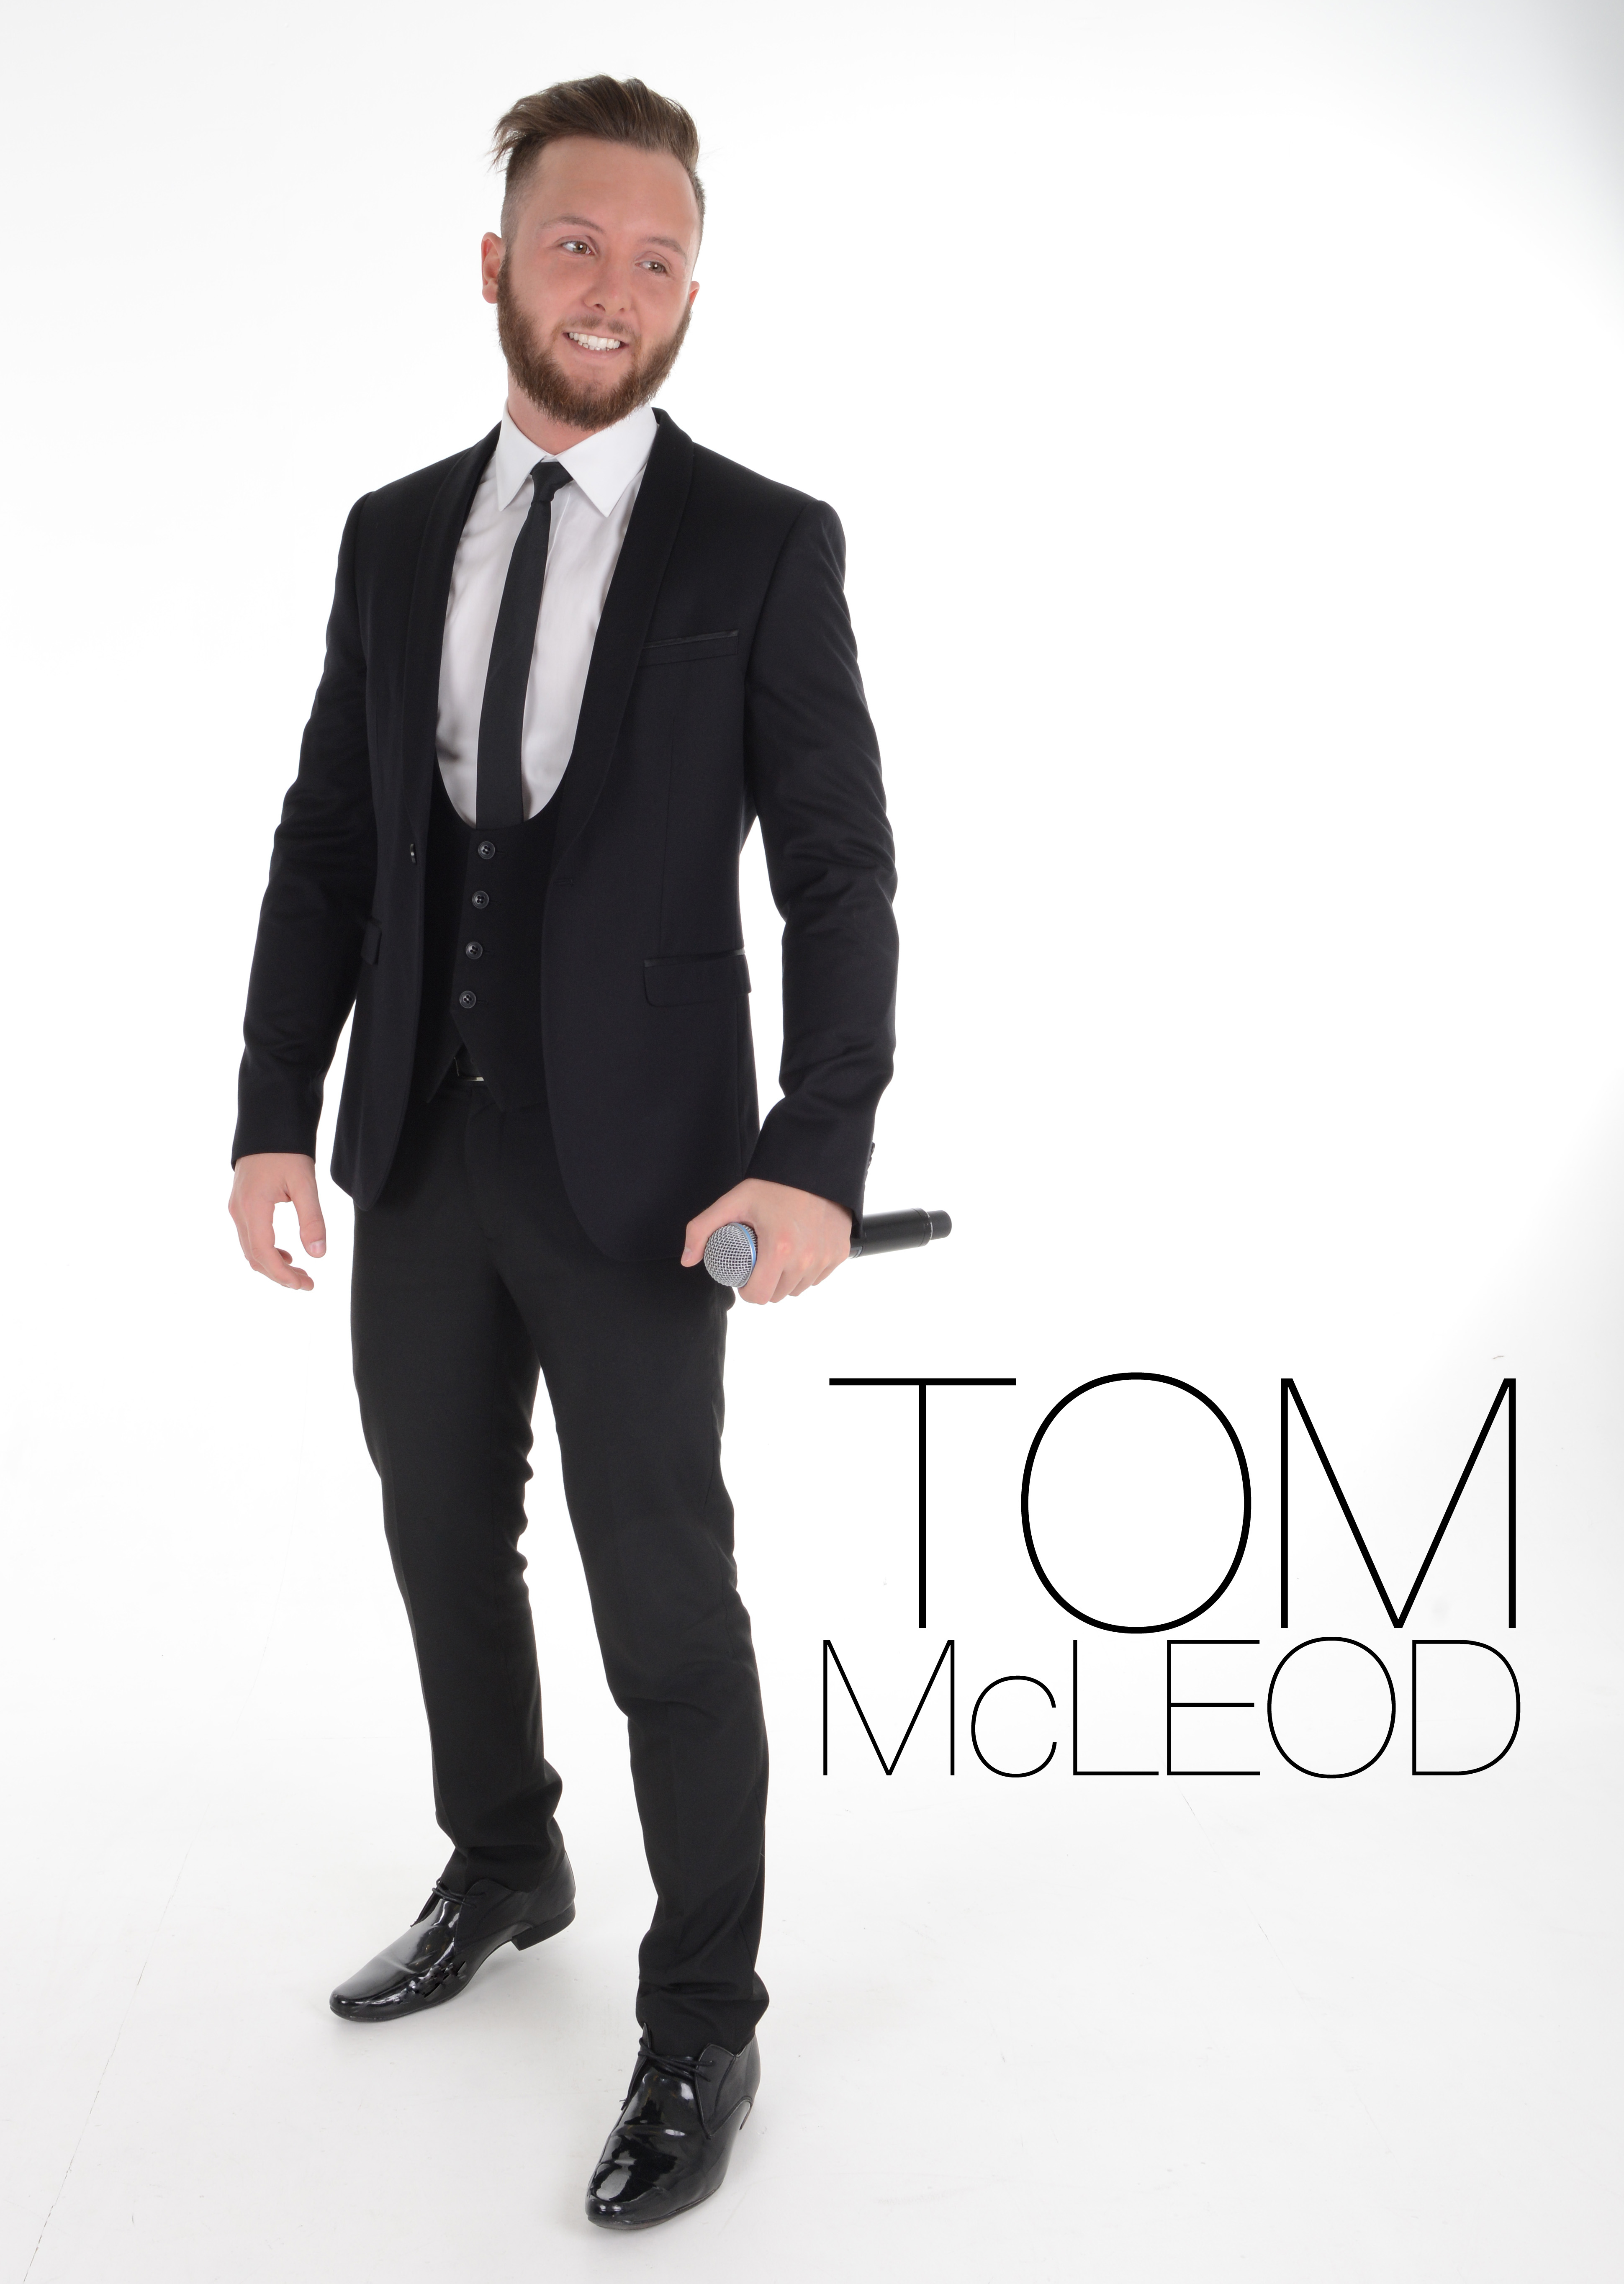 Tom McLeod